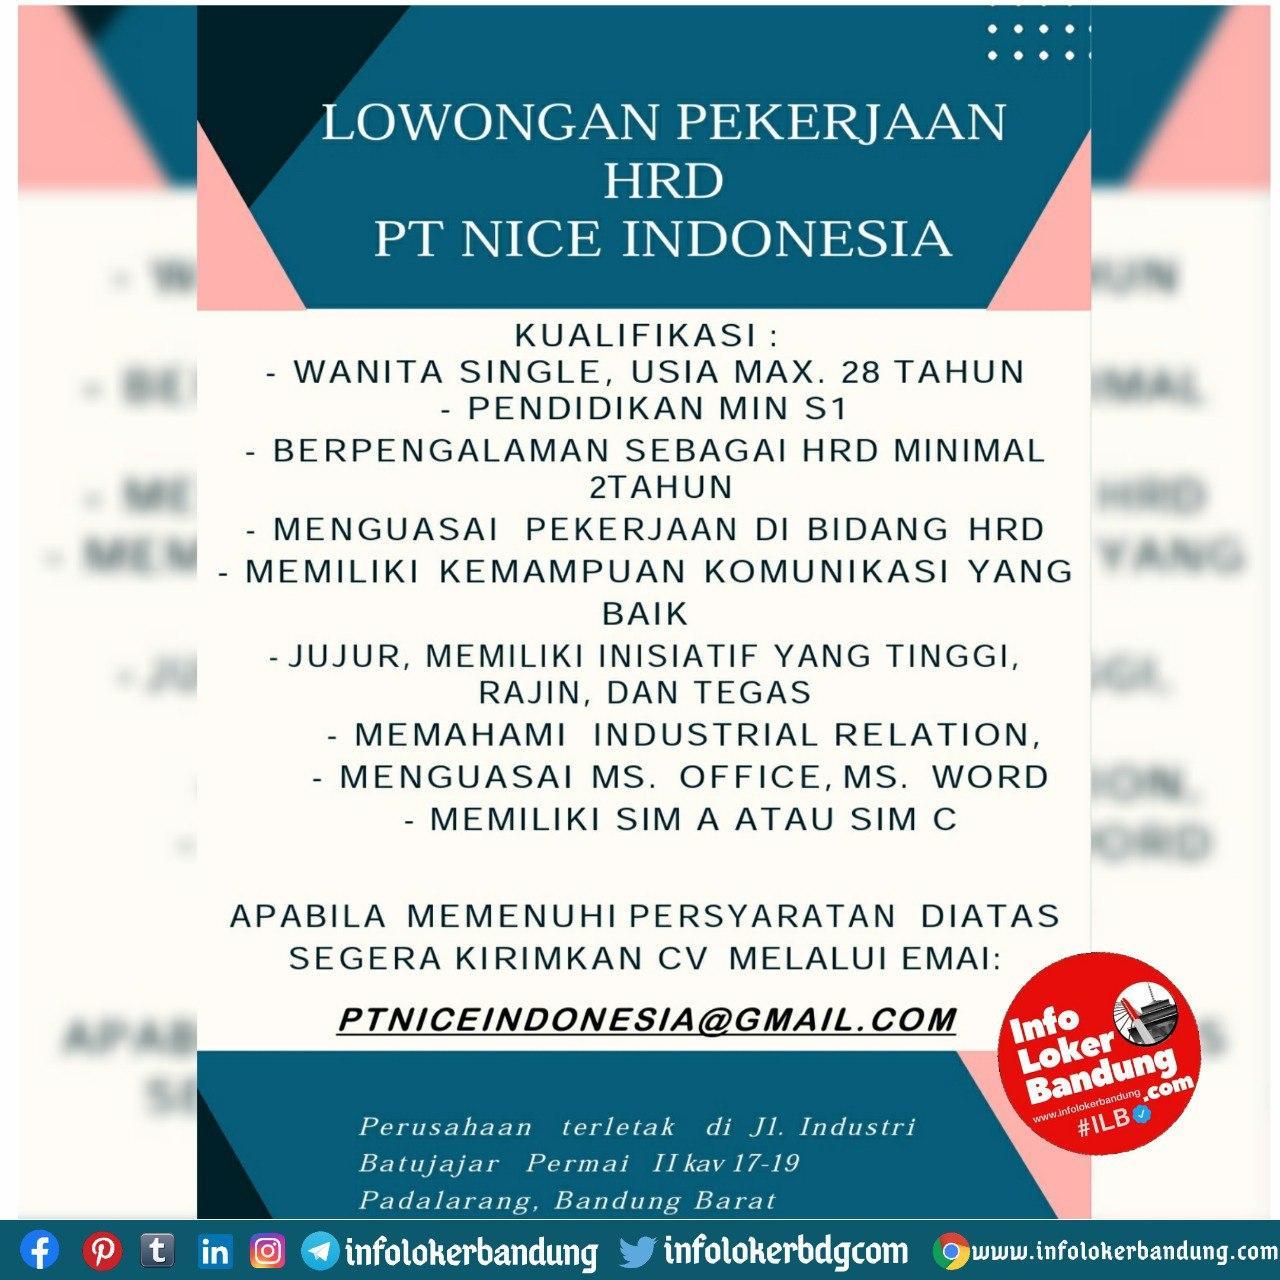 Lowongan Kerja Pt Nice Indonesia Bandung Oktober 2020 Info Loker Bandung 2021